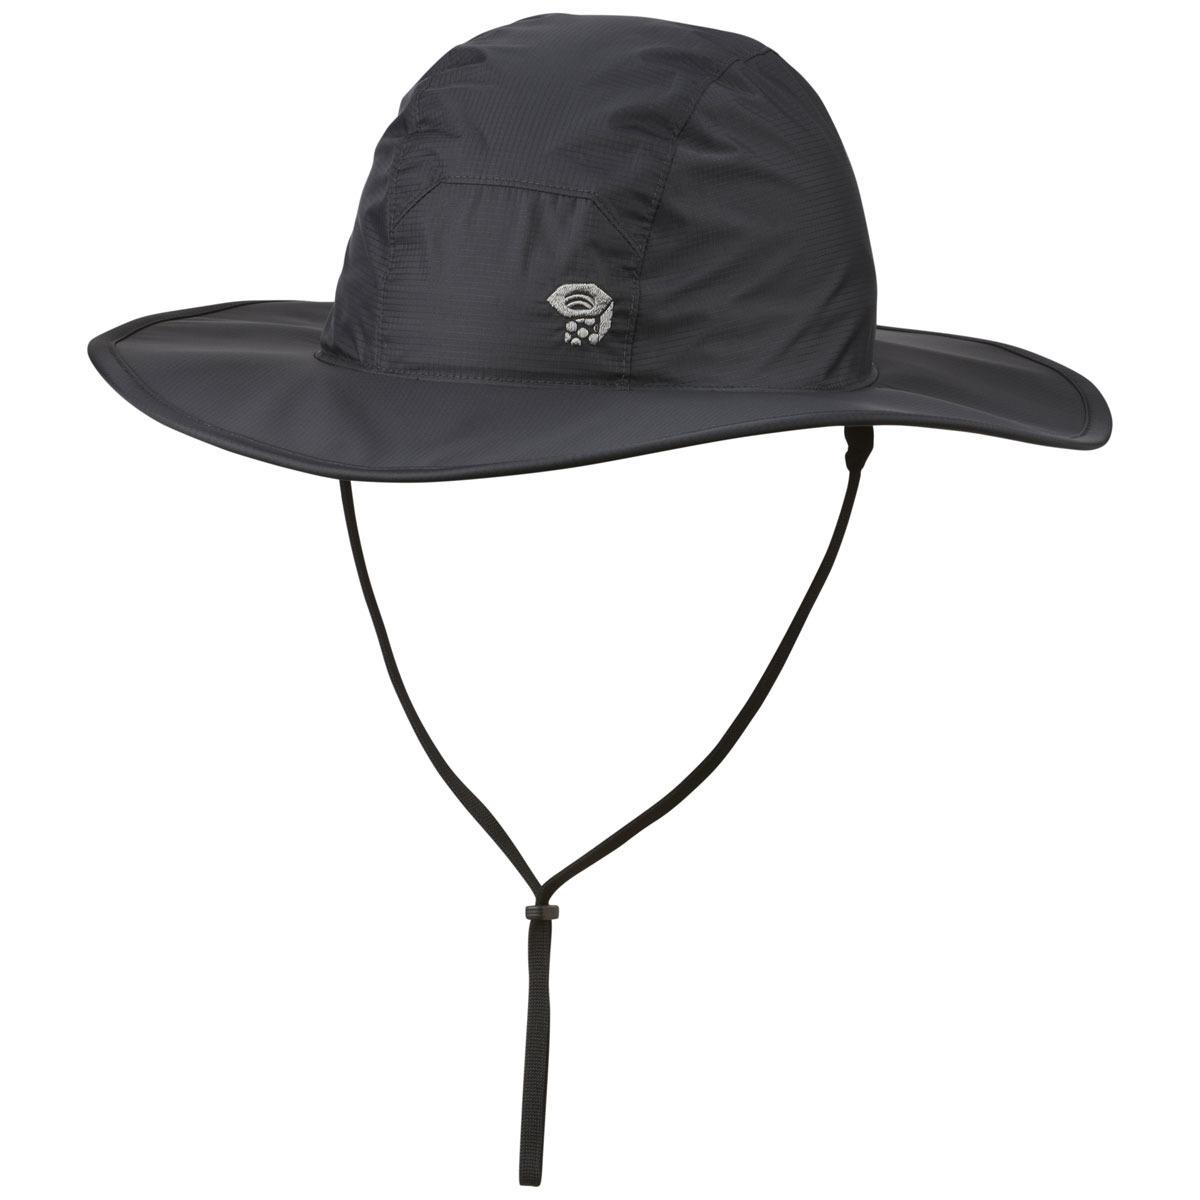 Sombrero Impermeable Para Lluvia Transpirable Negro -   110.000 en ... 9d891623516